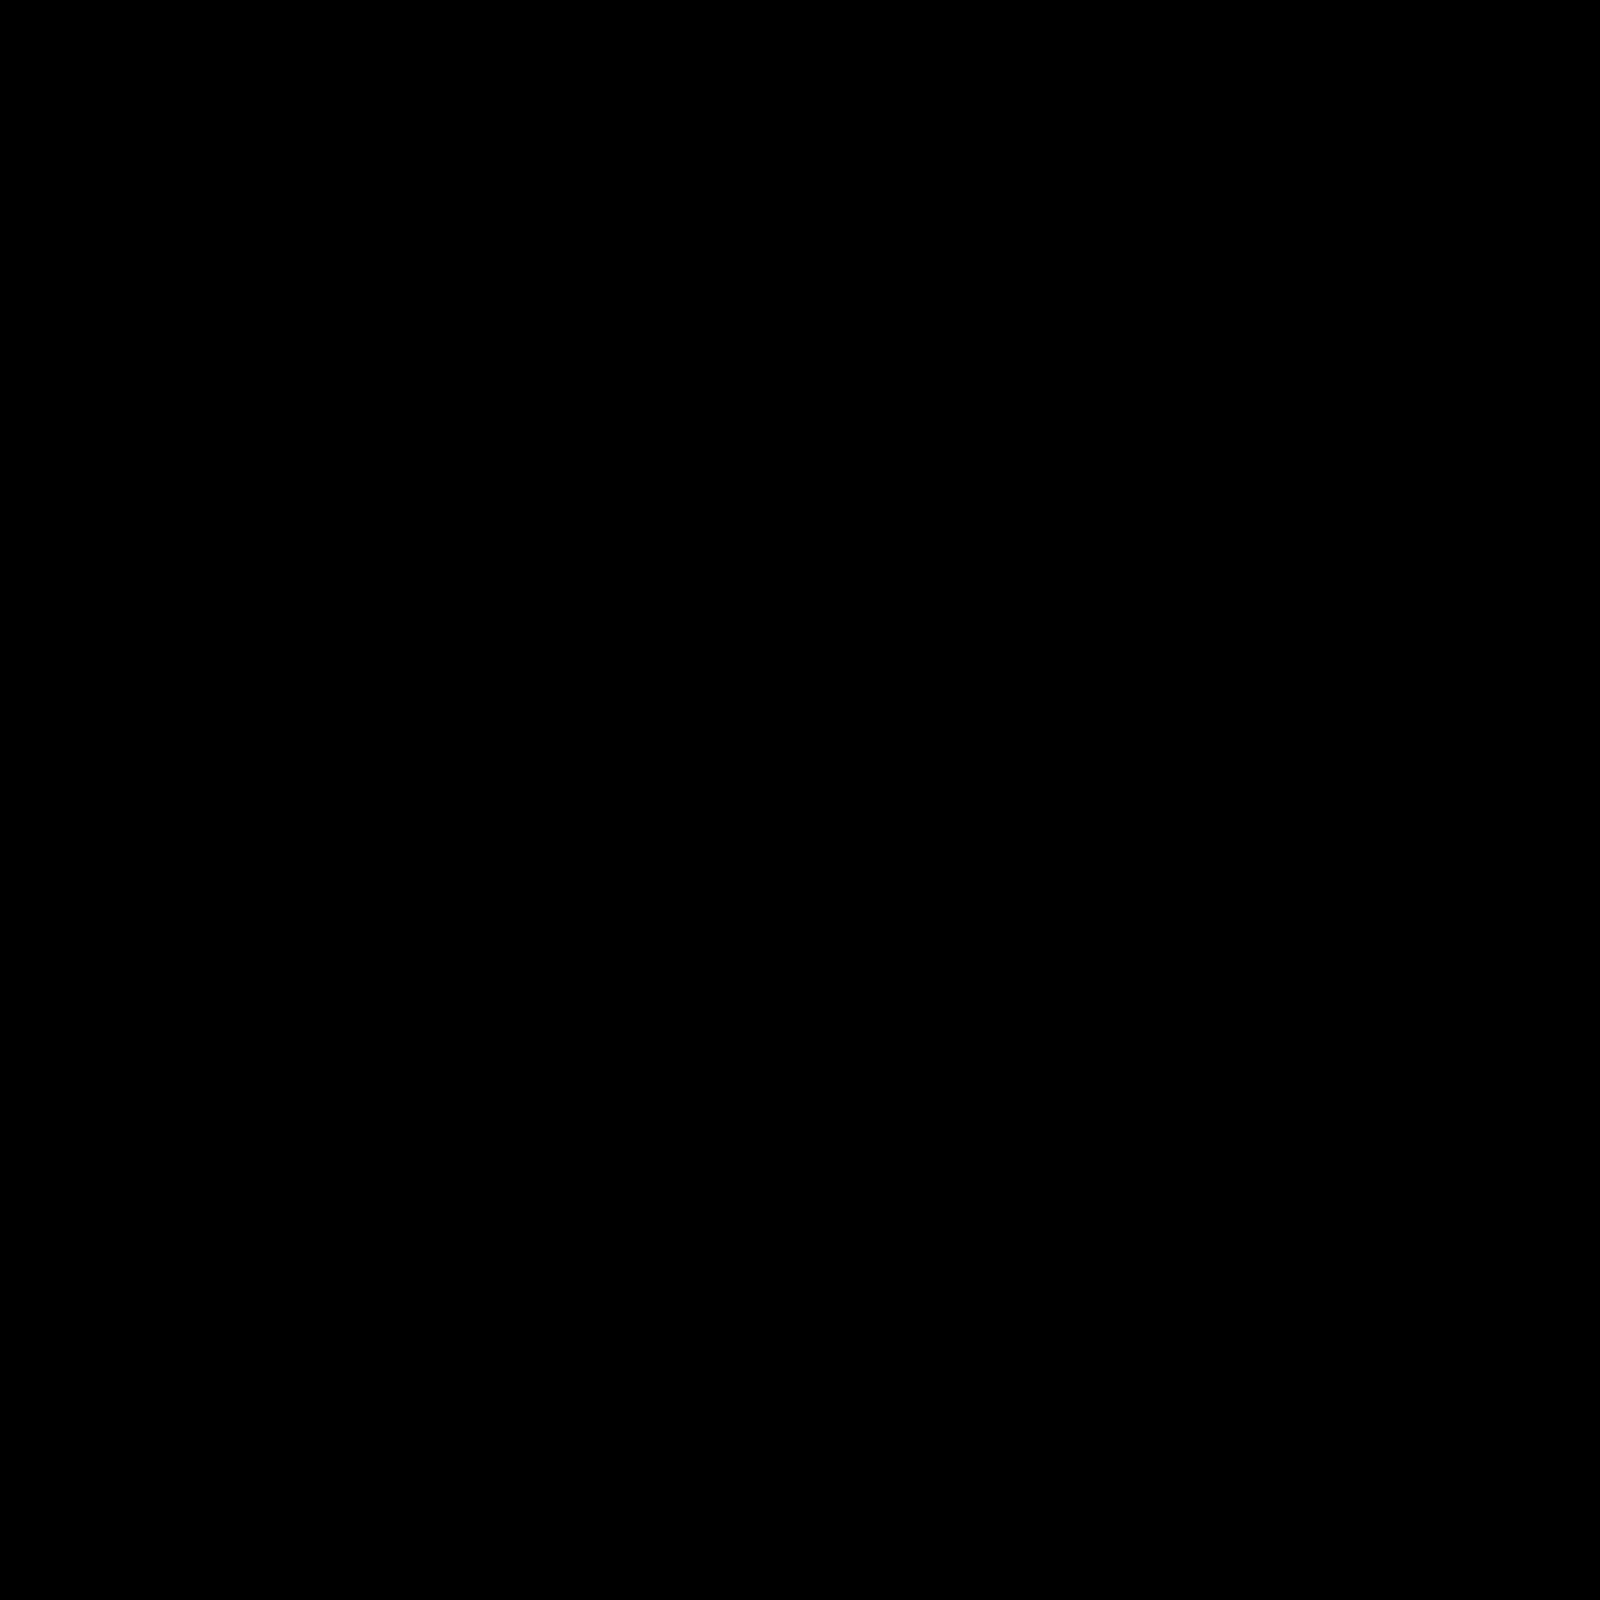 Erase Image Filled icon